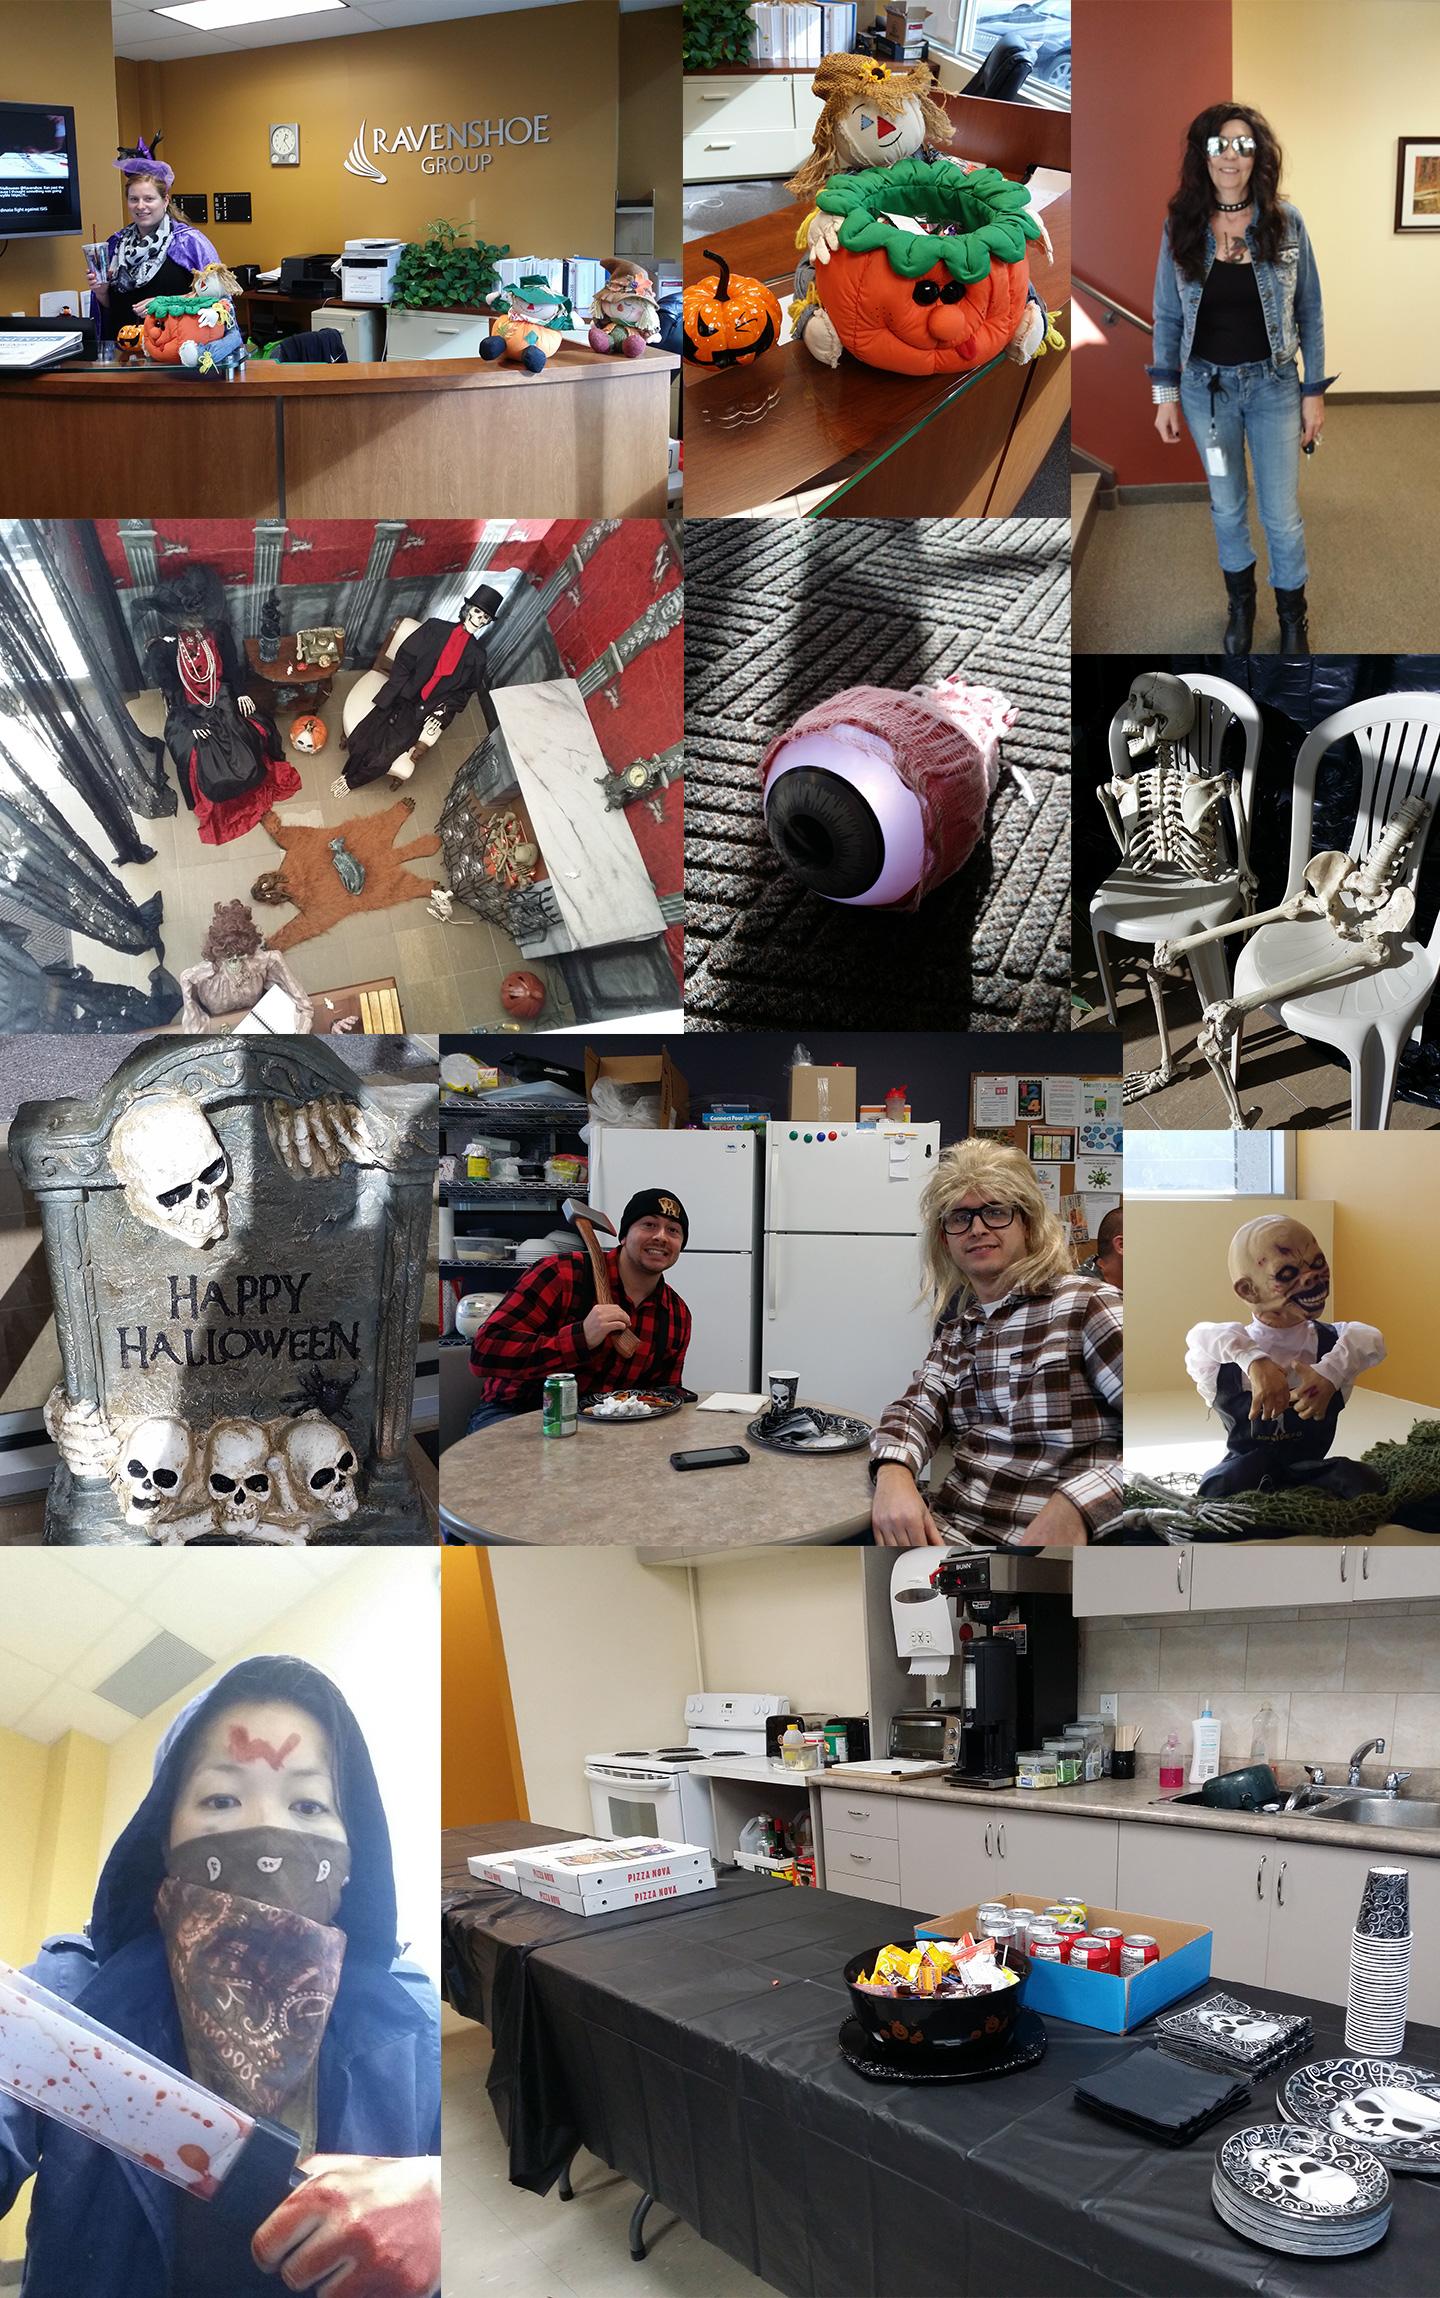 Ravenshoe Halloween Collage 2015